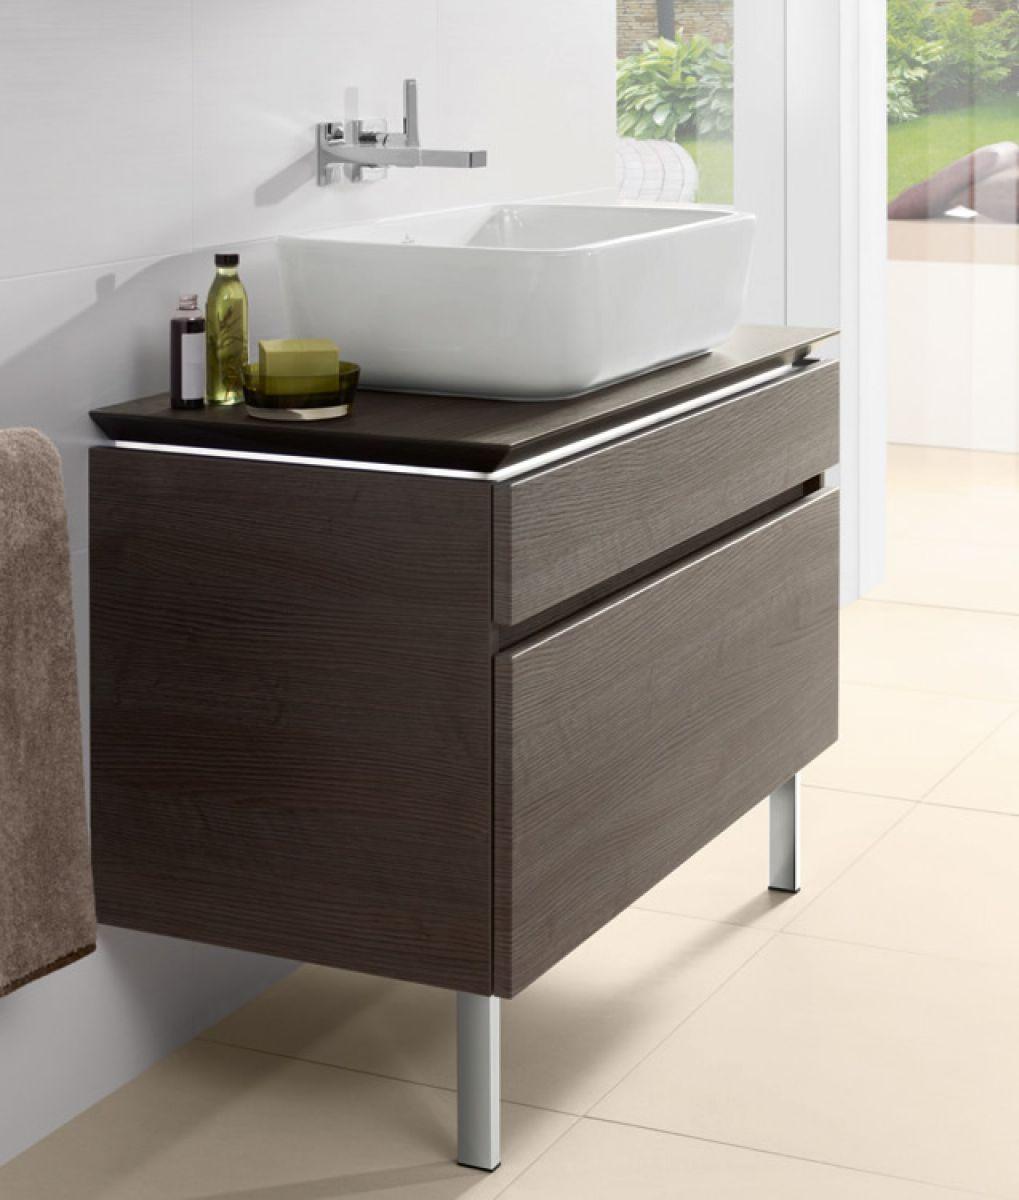 Villeroy and boch bathroom cabinets - Bathroom Vanity Units Corner Vanities Soak Com